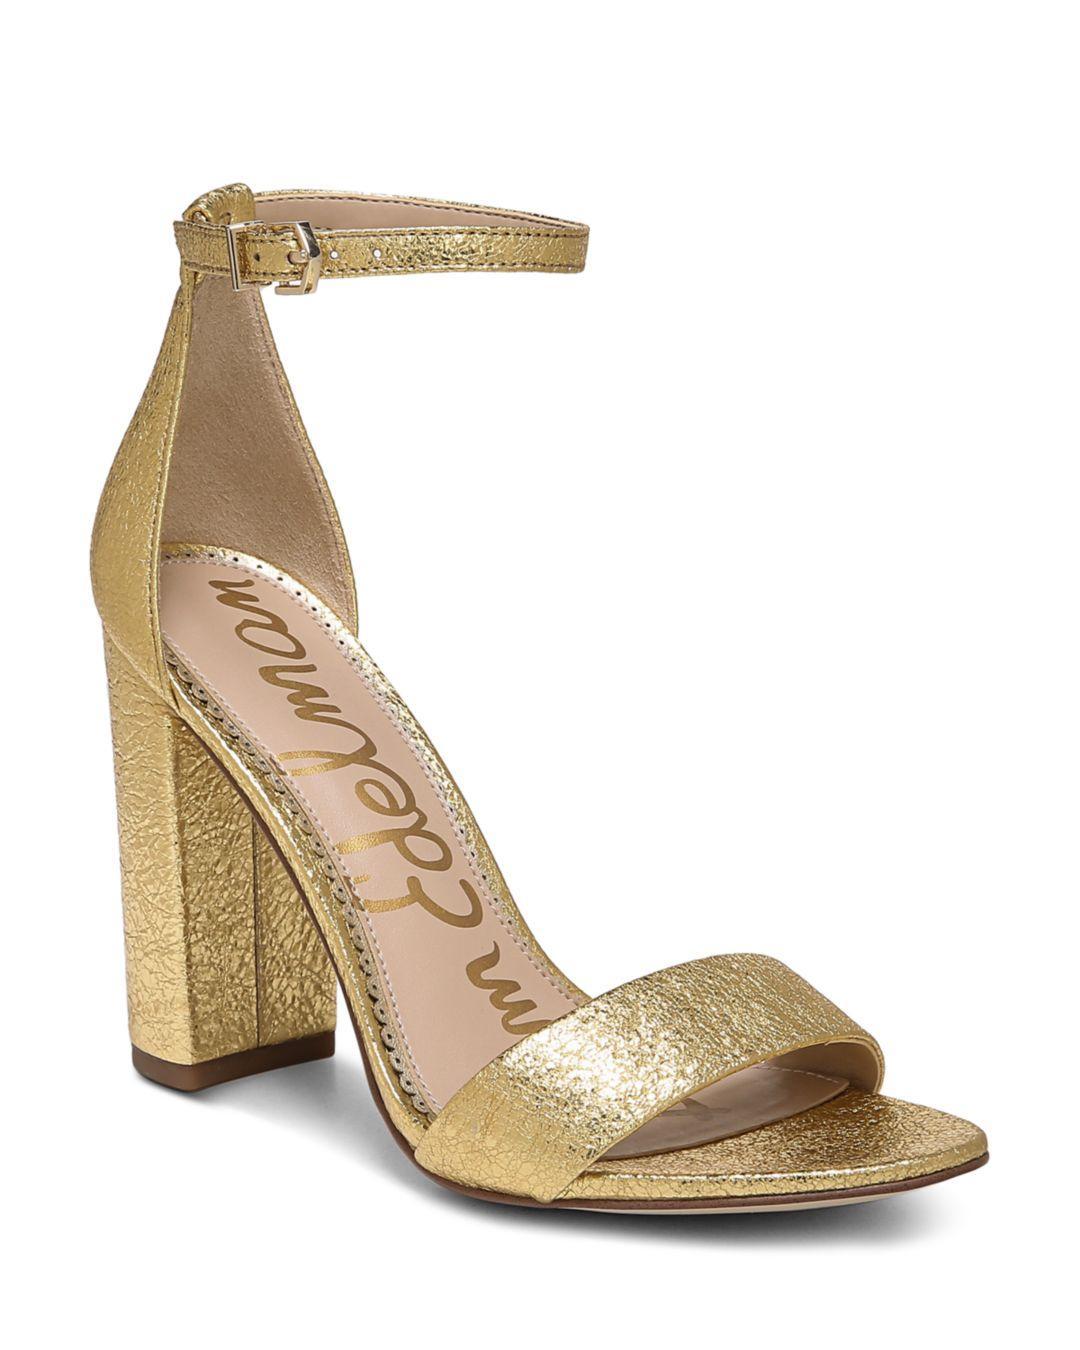 089f18a484a9 Lyst - Sam Edelman Women s Yaro Ankle Strap Block Heel Sandals in ...